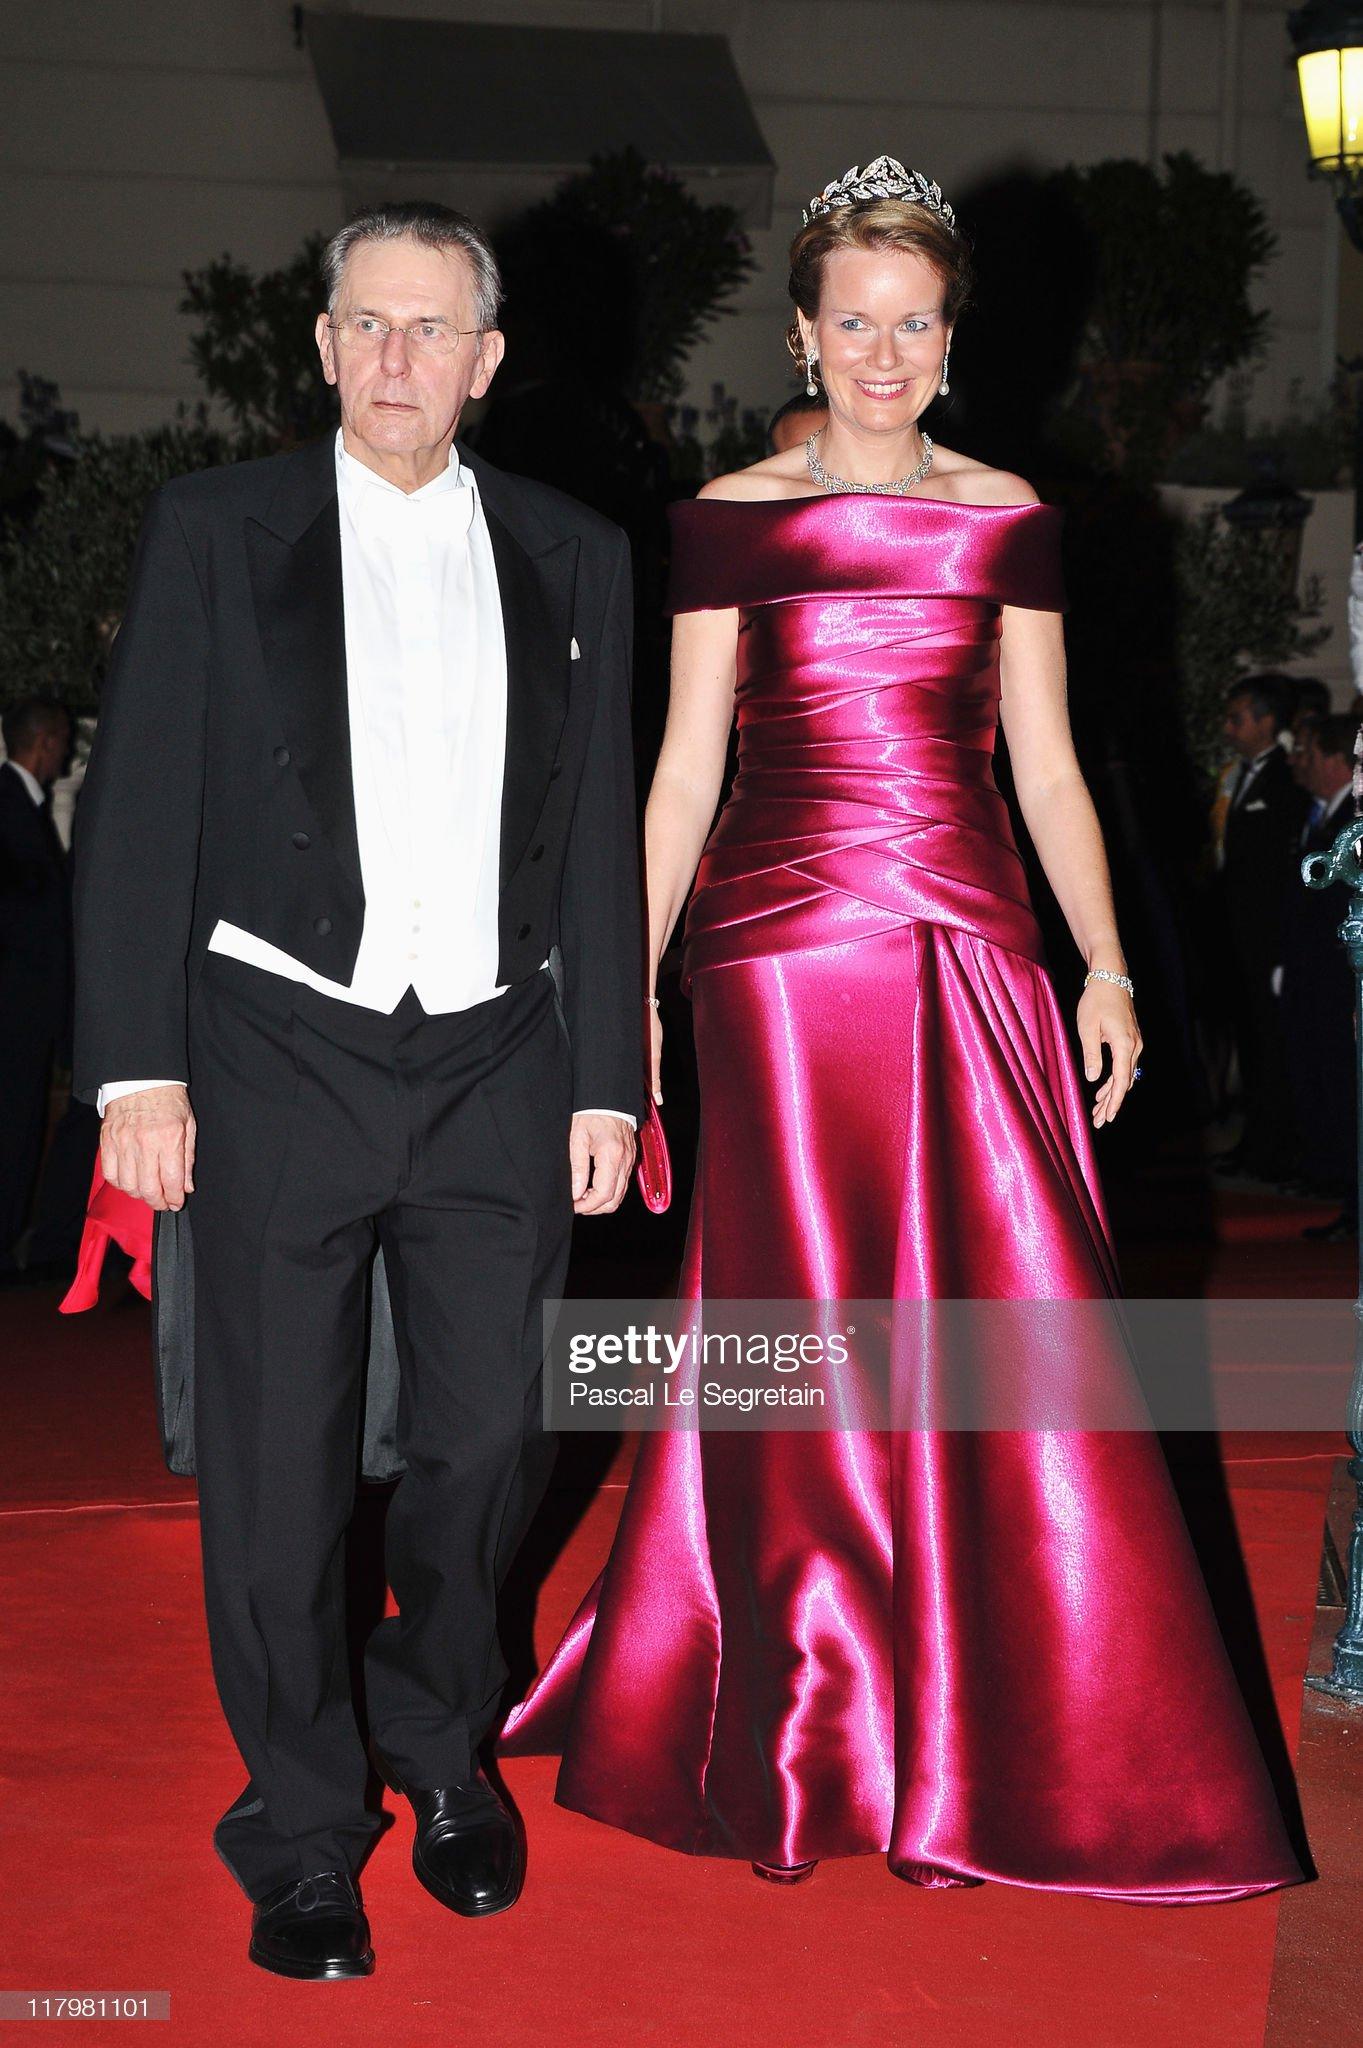 Вечерние наряды Королевы Матильды Monaco Royal Wedding - Dinner and Fireworks : News Photo